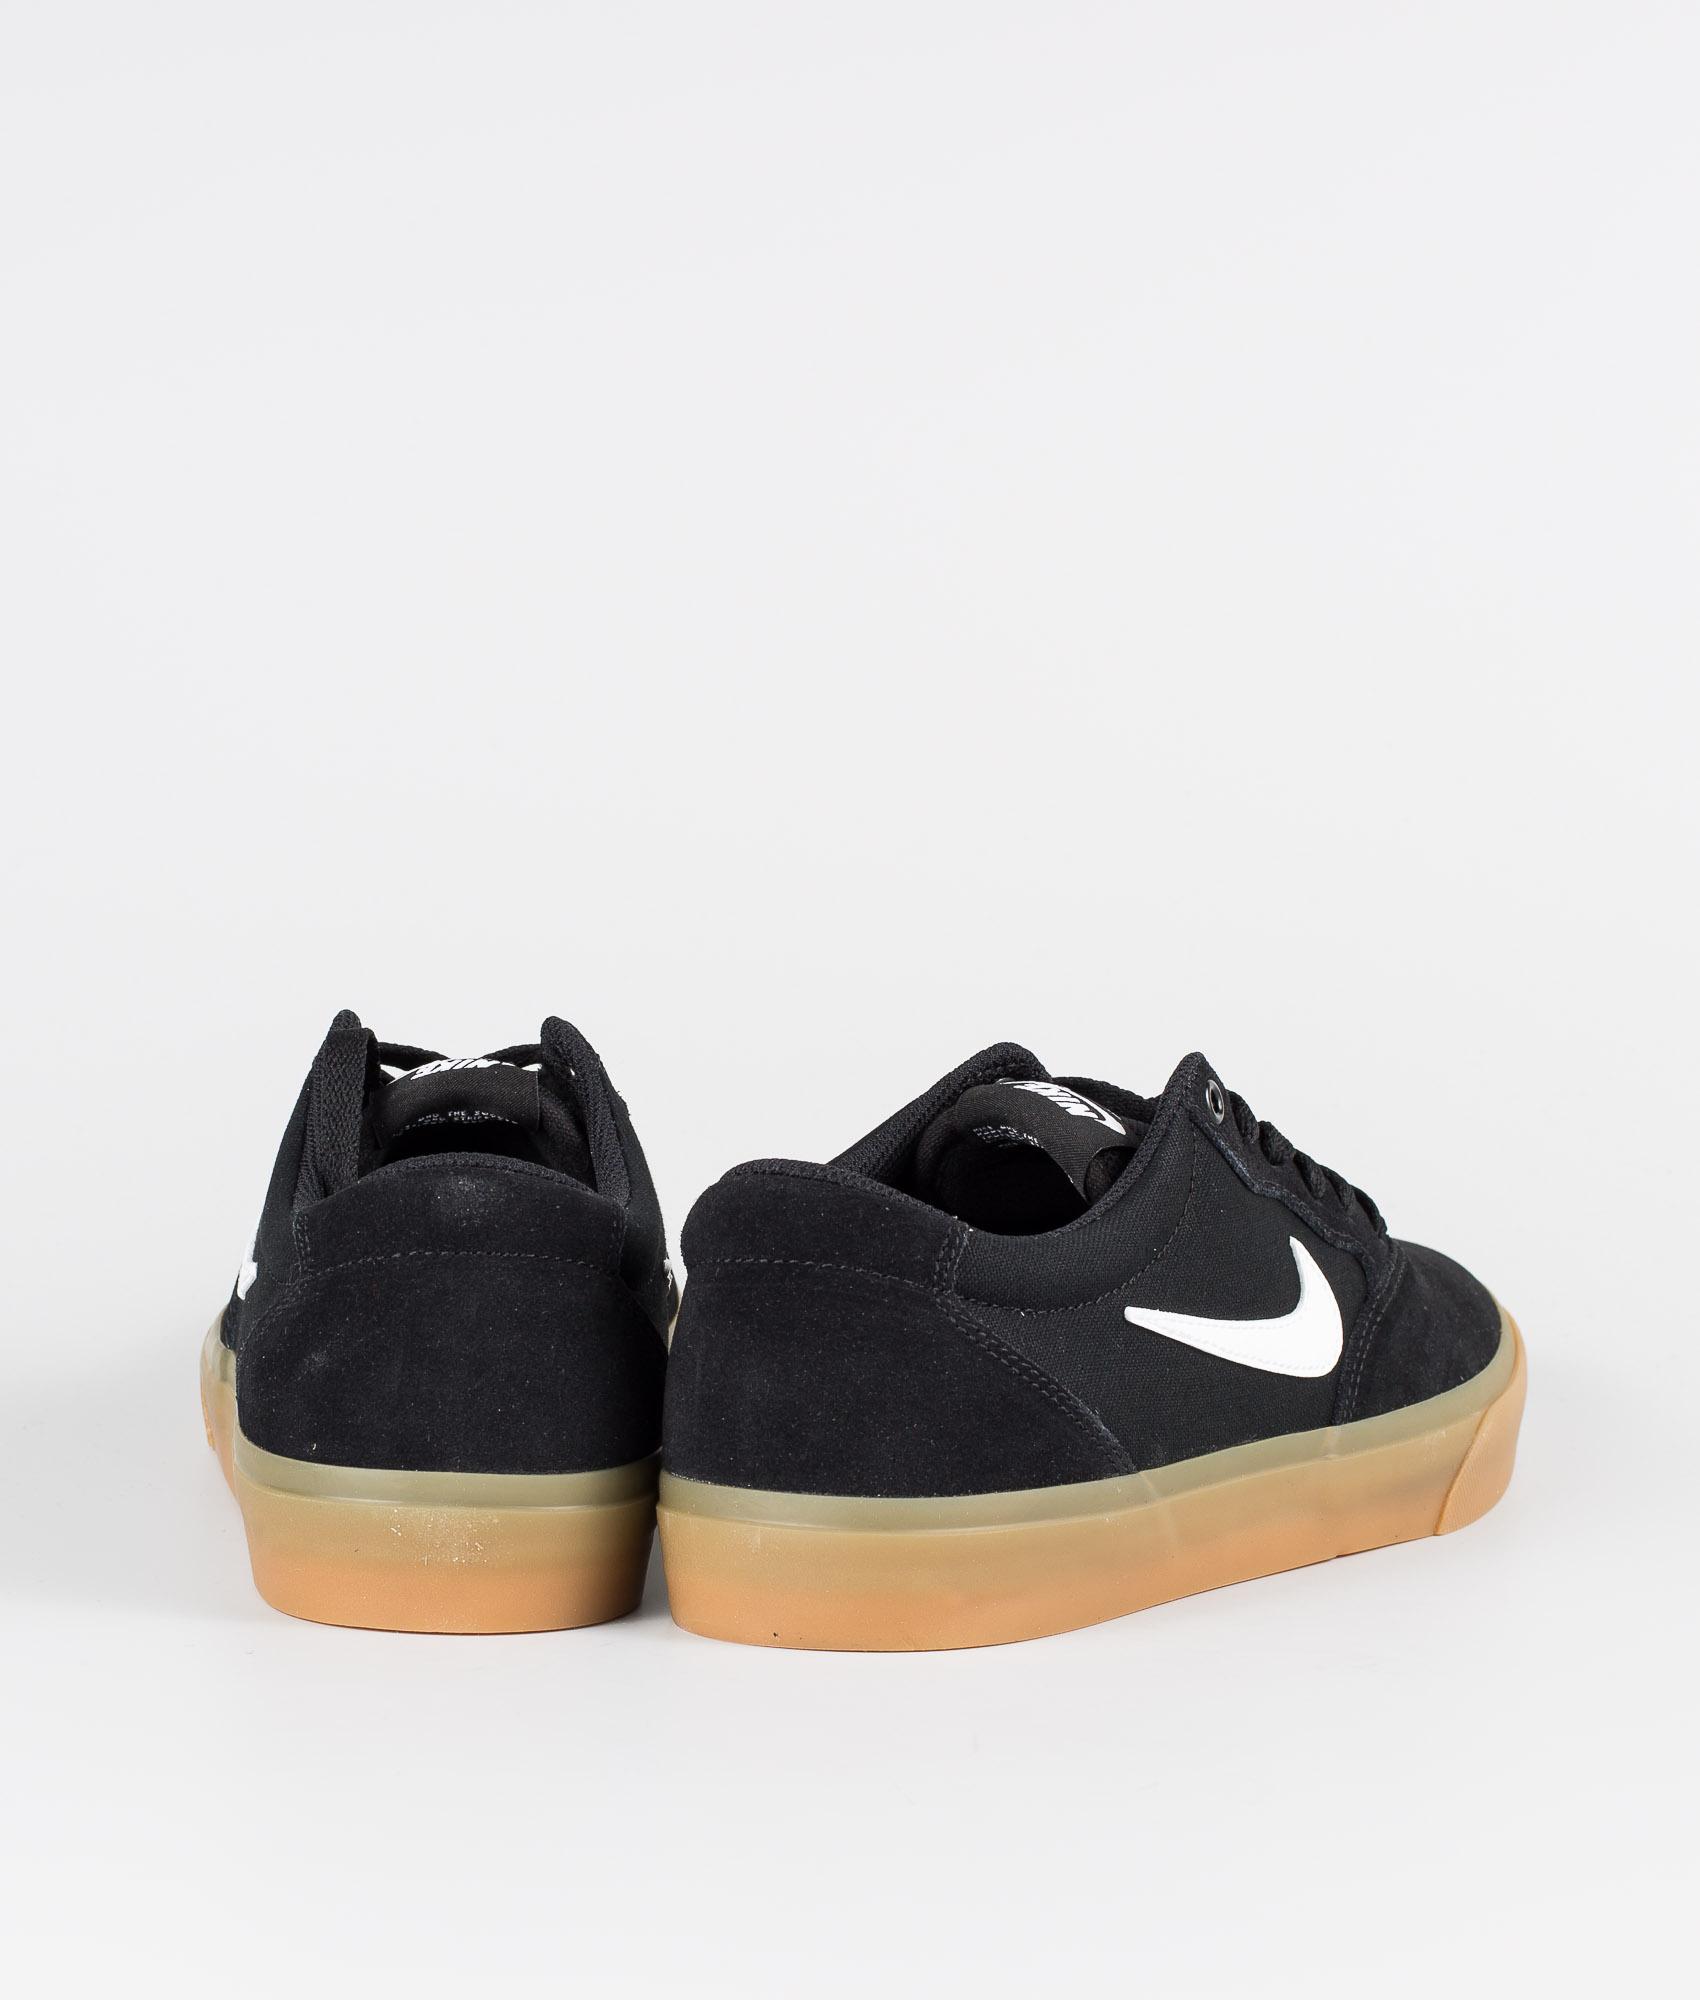 Nike SB Chron SLR Shoes BlackWhite